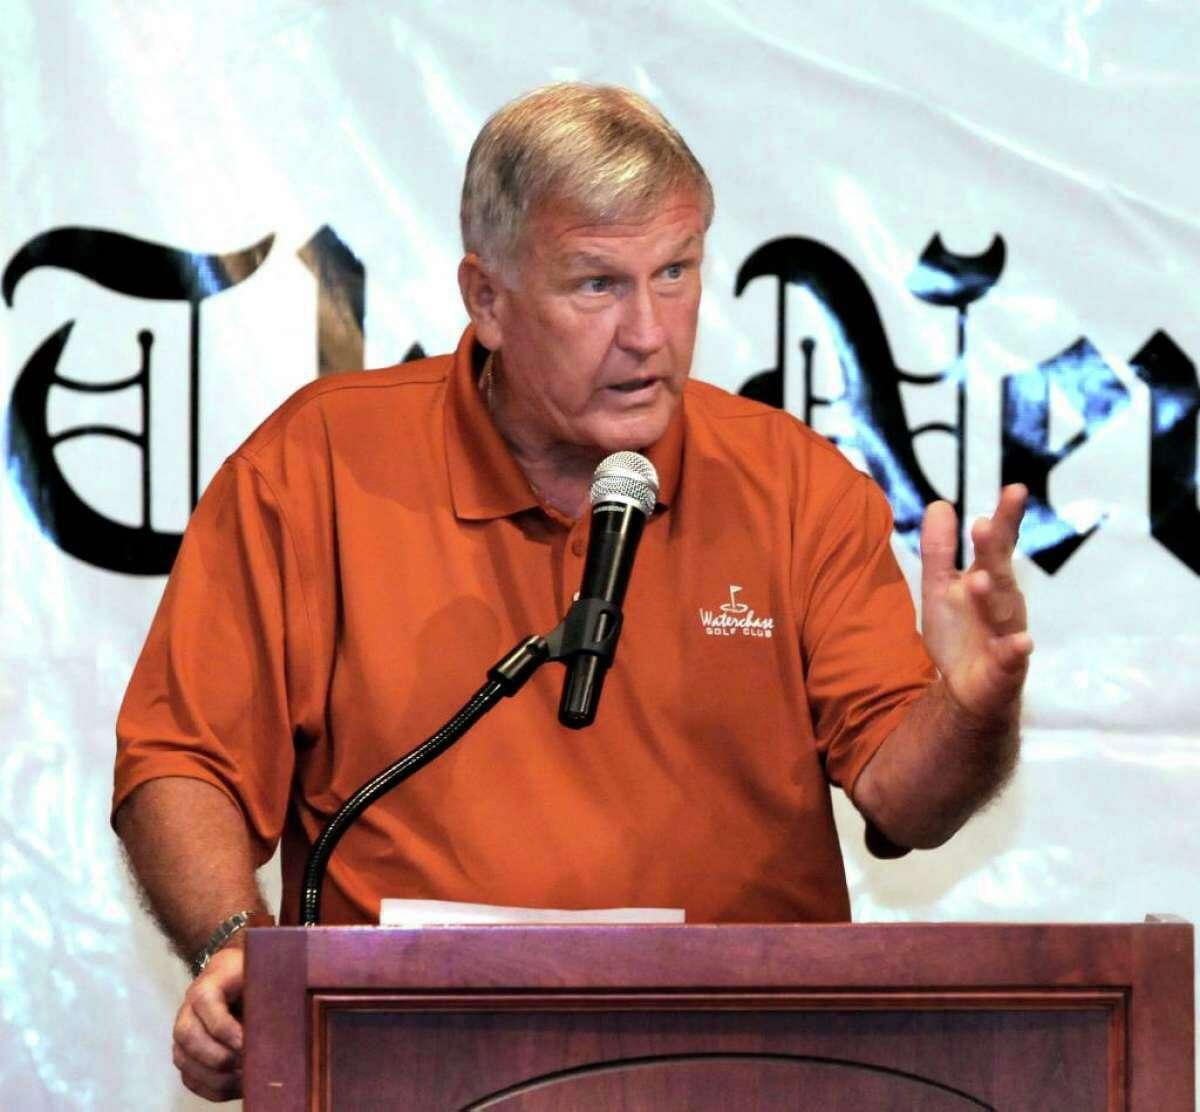 Tommy John, former Major League Baseball pitcher, spoke at the Danbury Westerners annual Celebrity Breakfast in 2010.